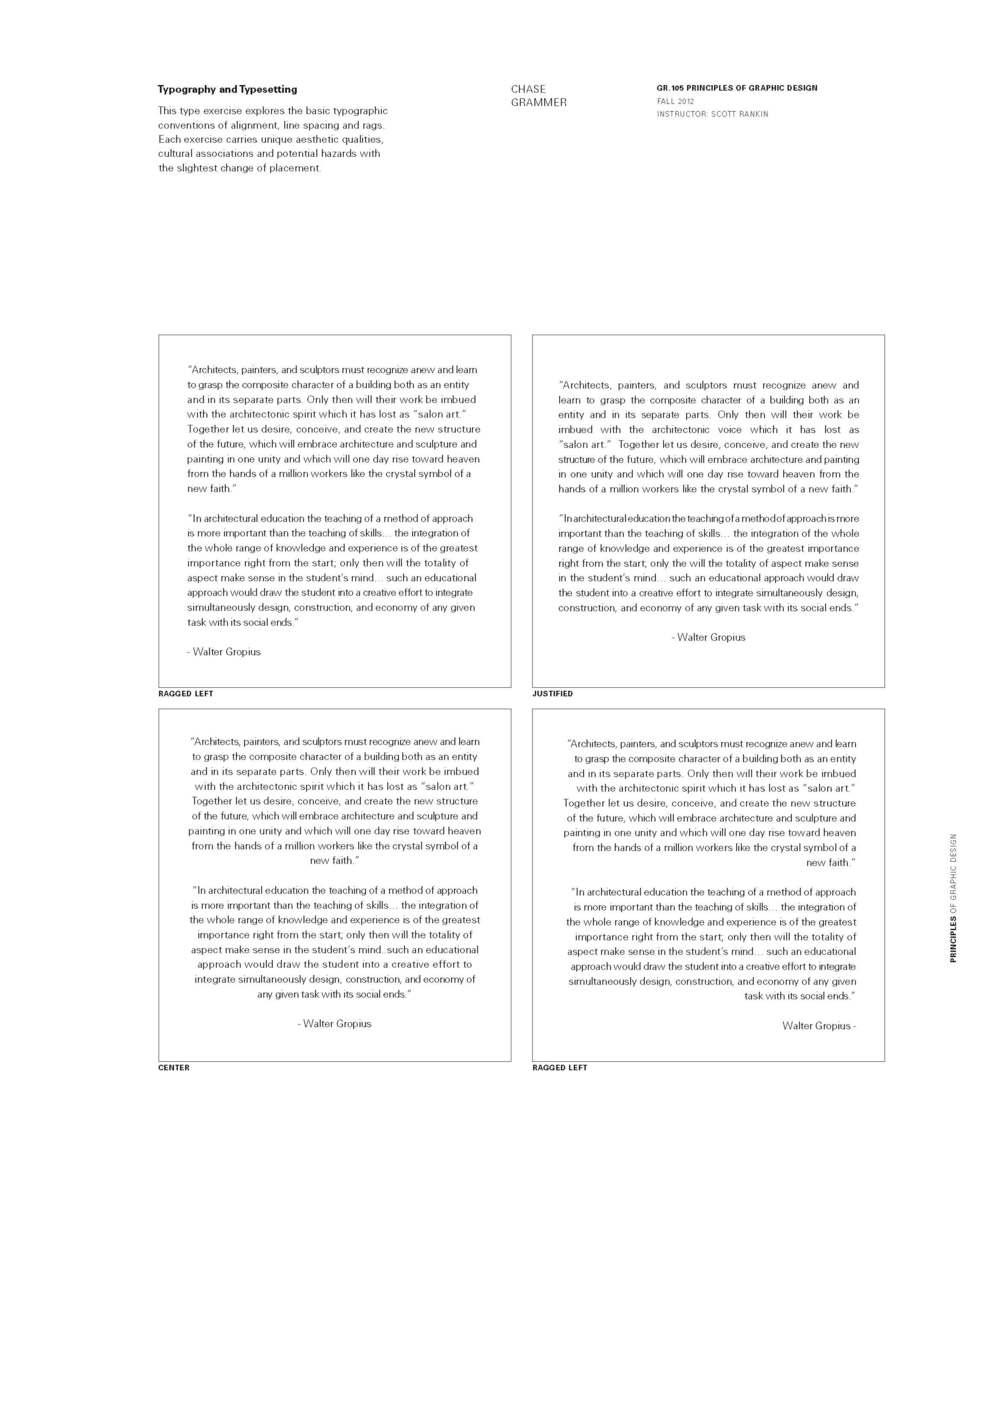 ScottFinal copy_Page_04.jpg